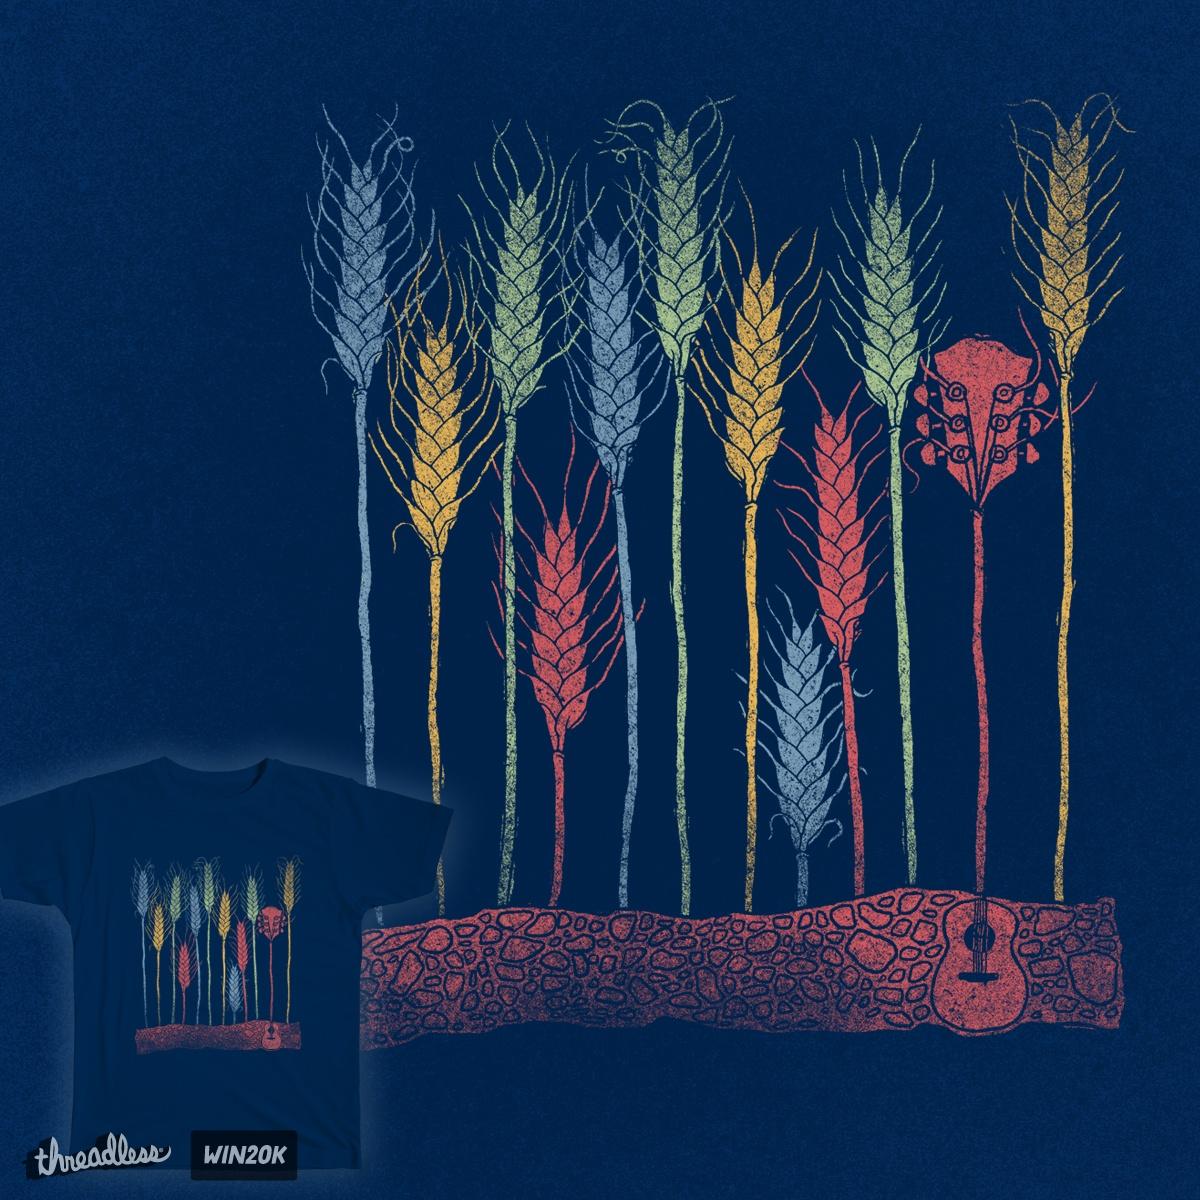 Frumentum musicalis. by maksloe on Threadless